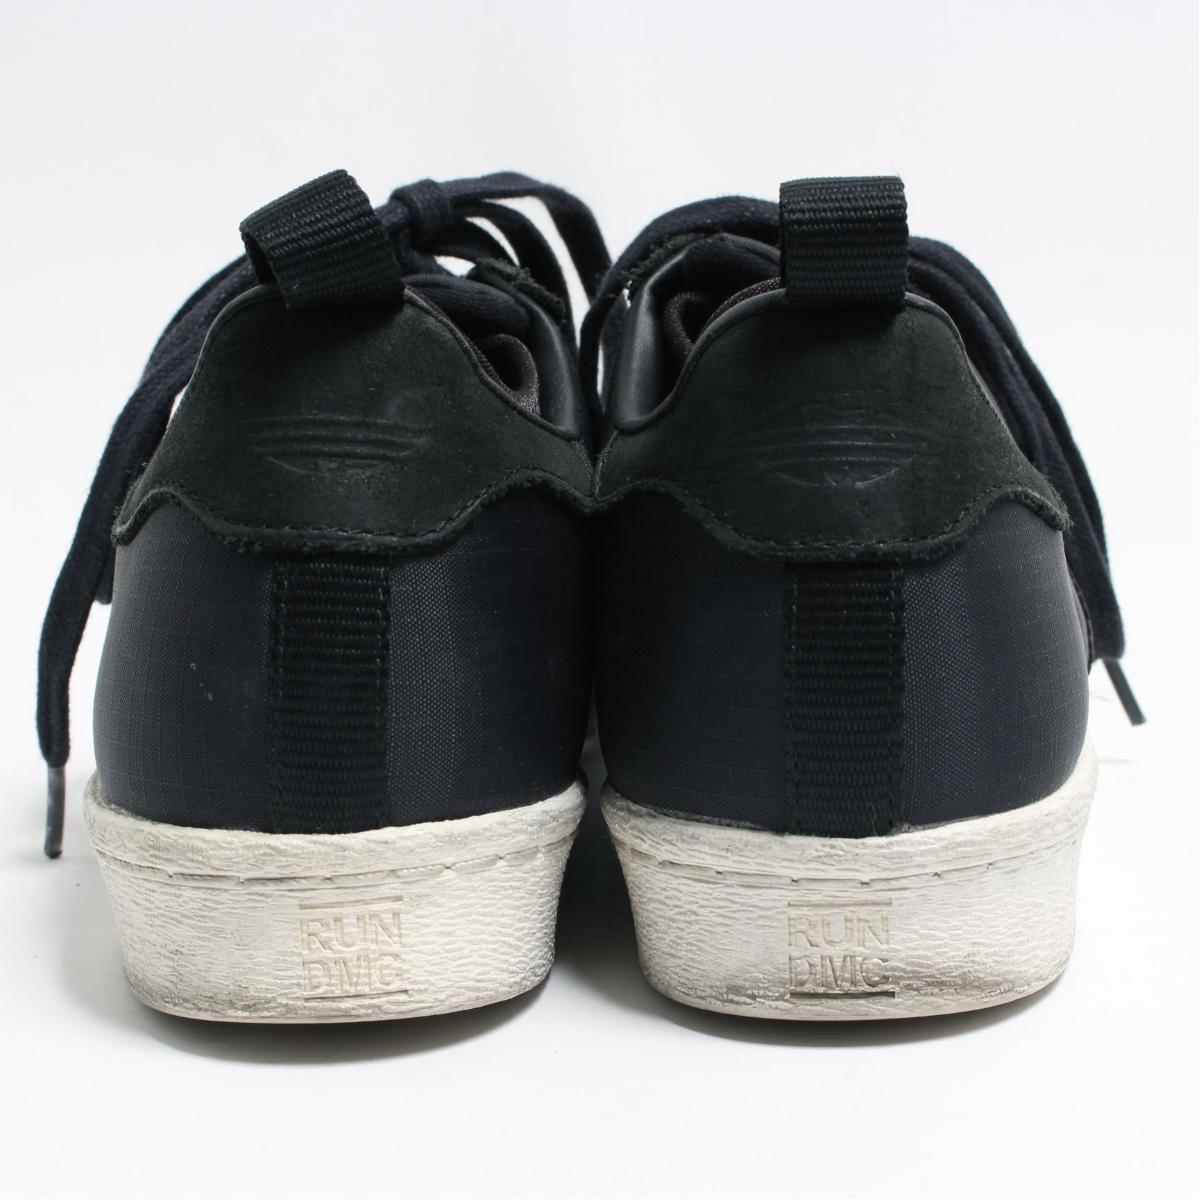 9b9abfe62c4 VINTAGE CLOTHING JAM  Adidas adidas RUN DMC X Keith Haring SUPERSTAR ...